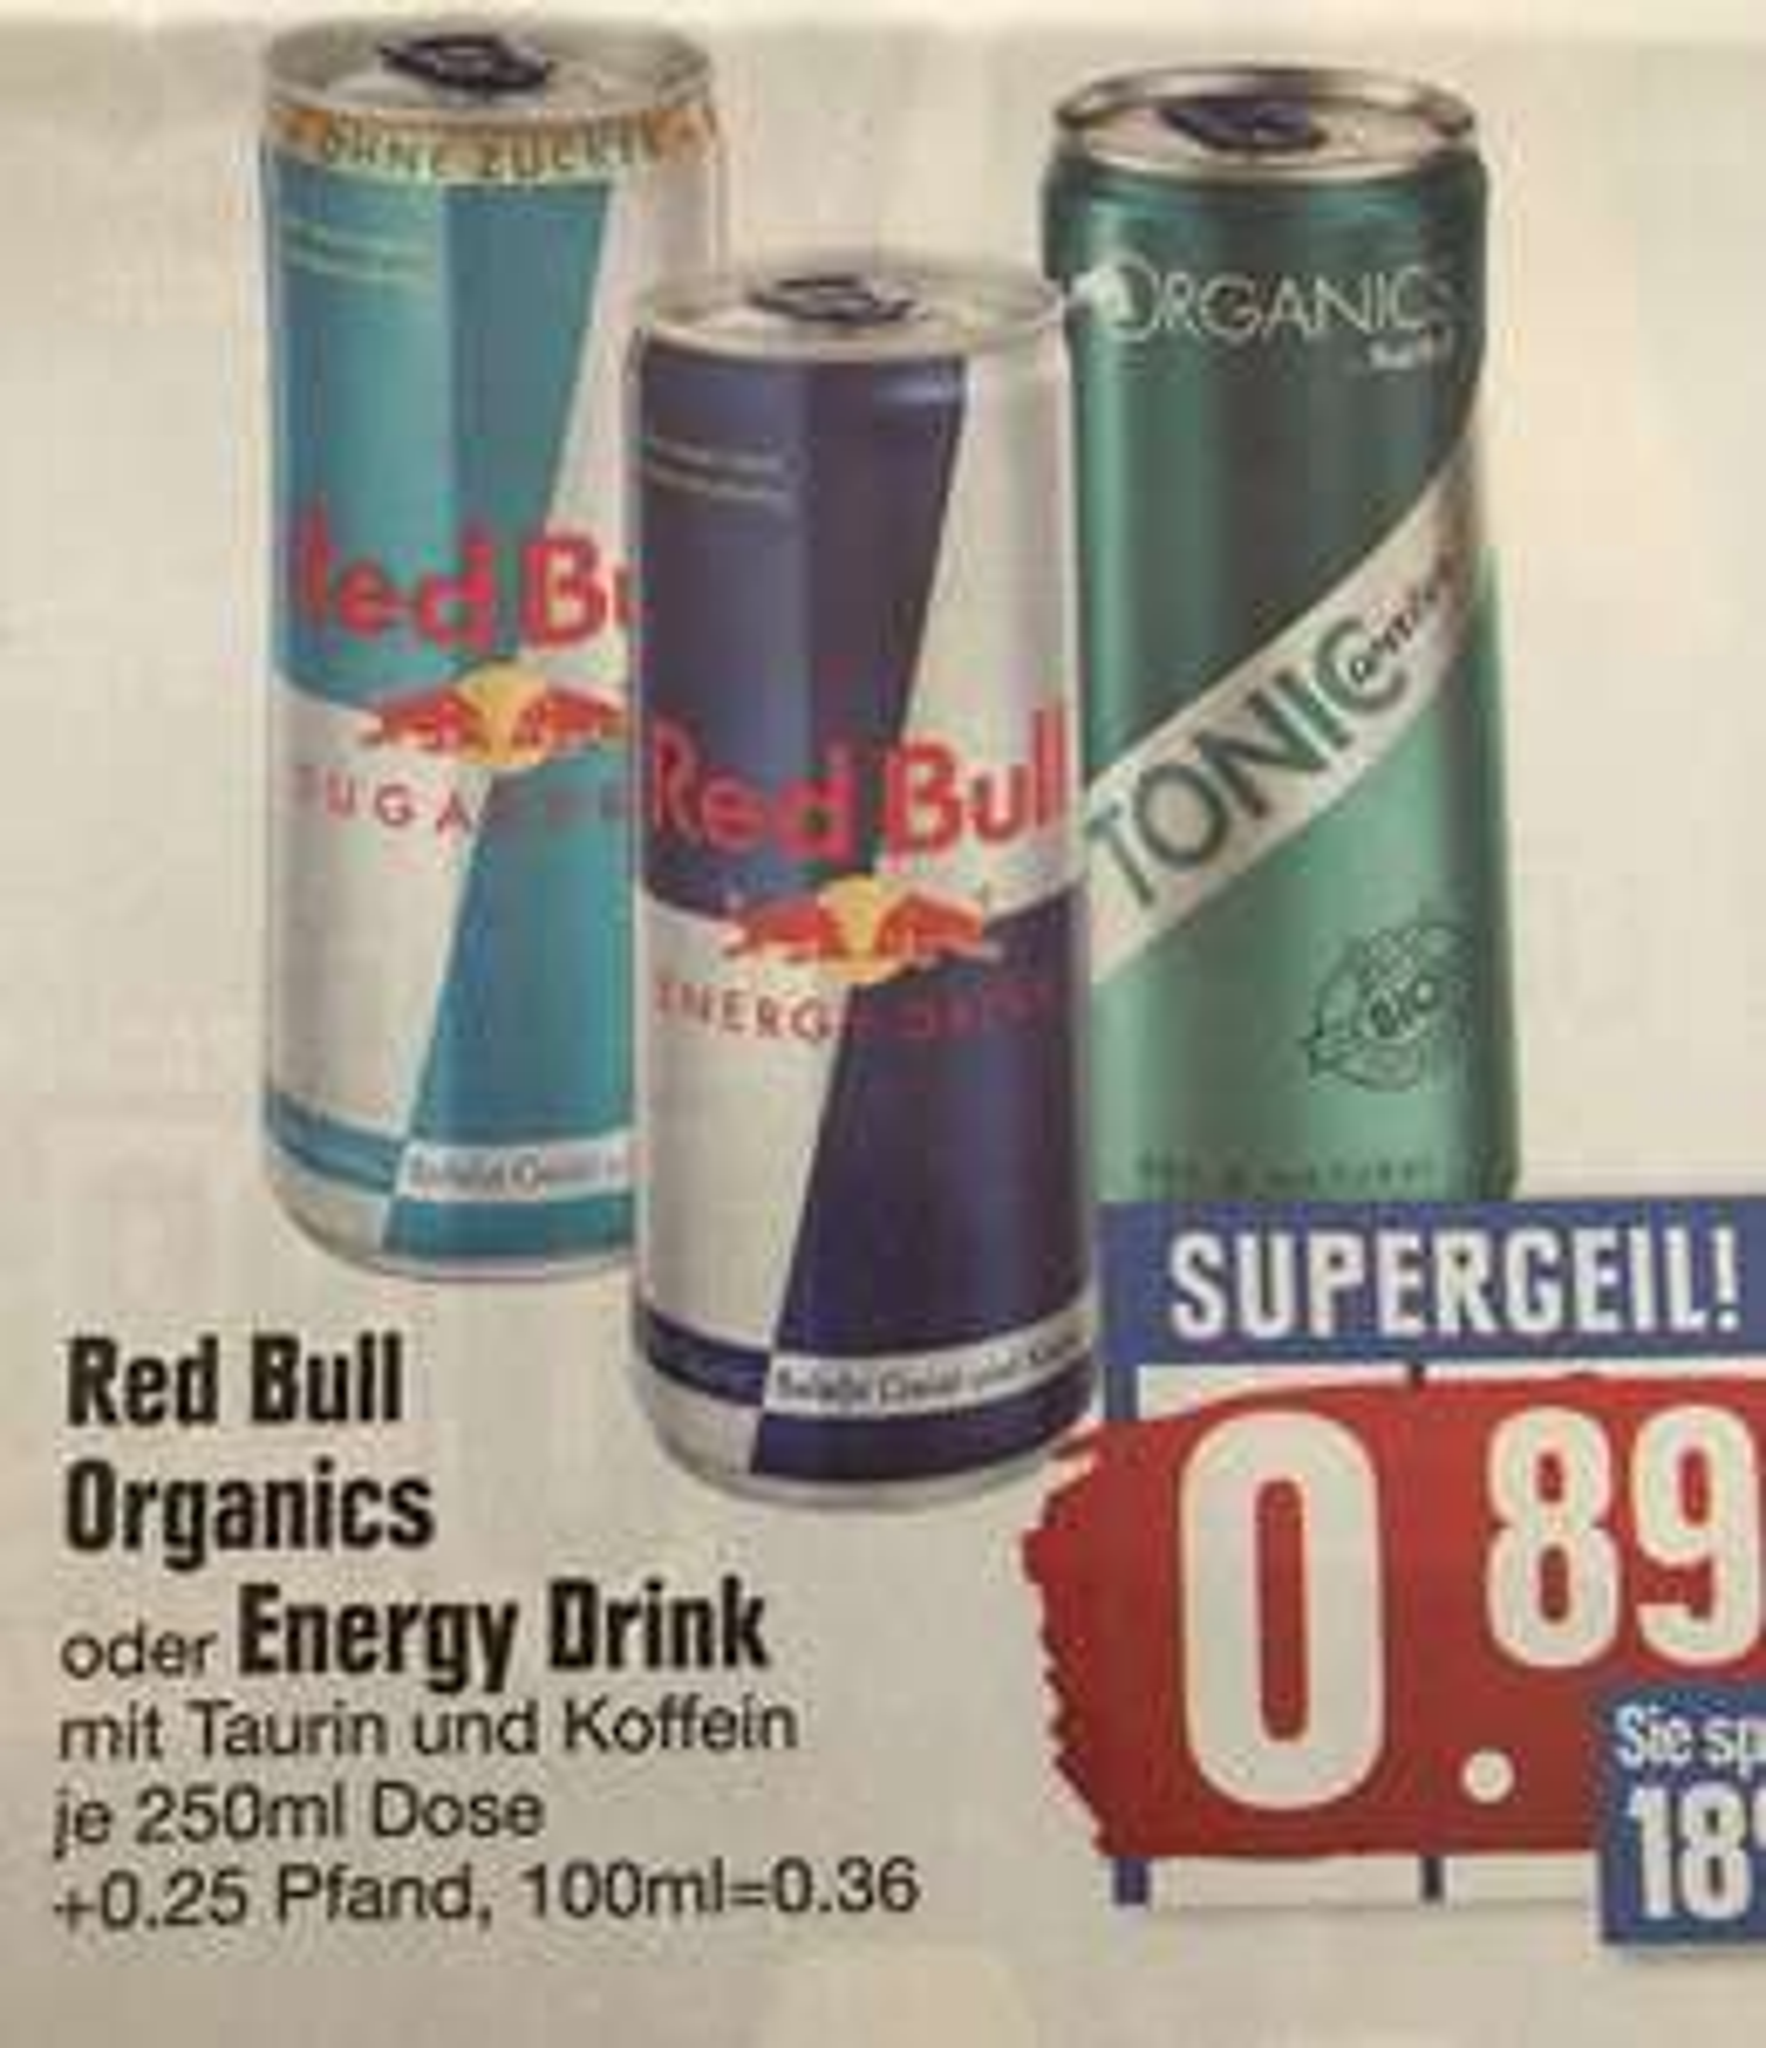 [Edeka Südbayern] Red Bull Organics und Energy Drinks für 0,89€